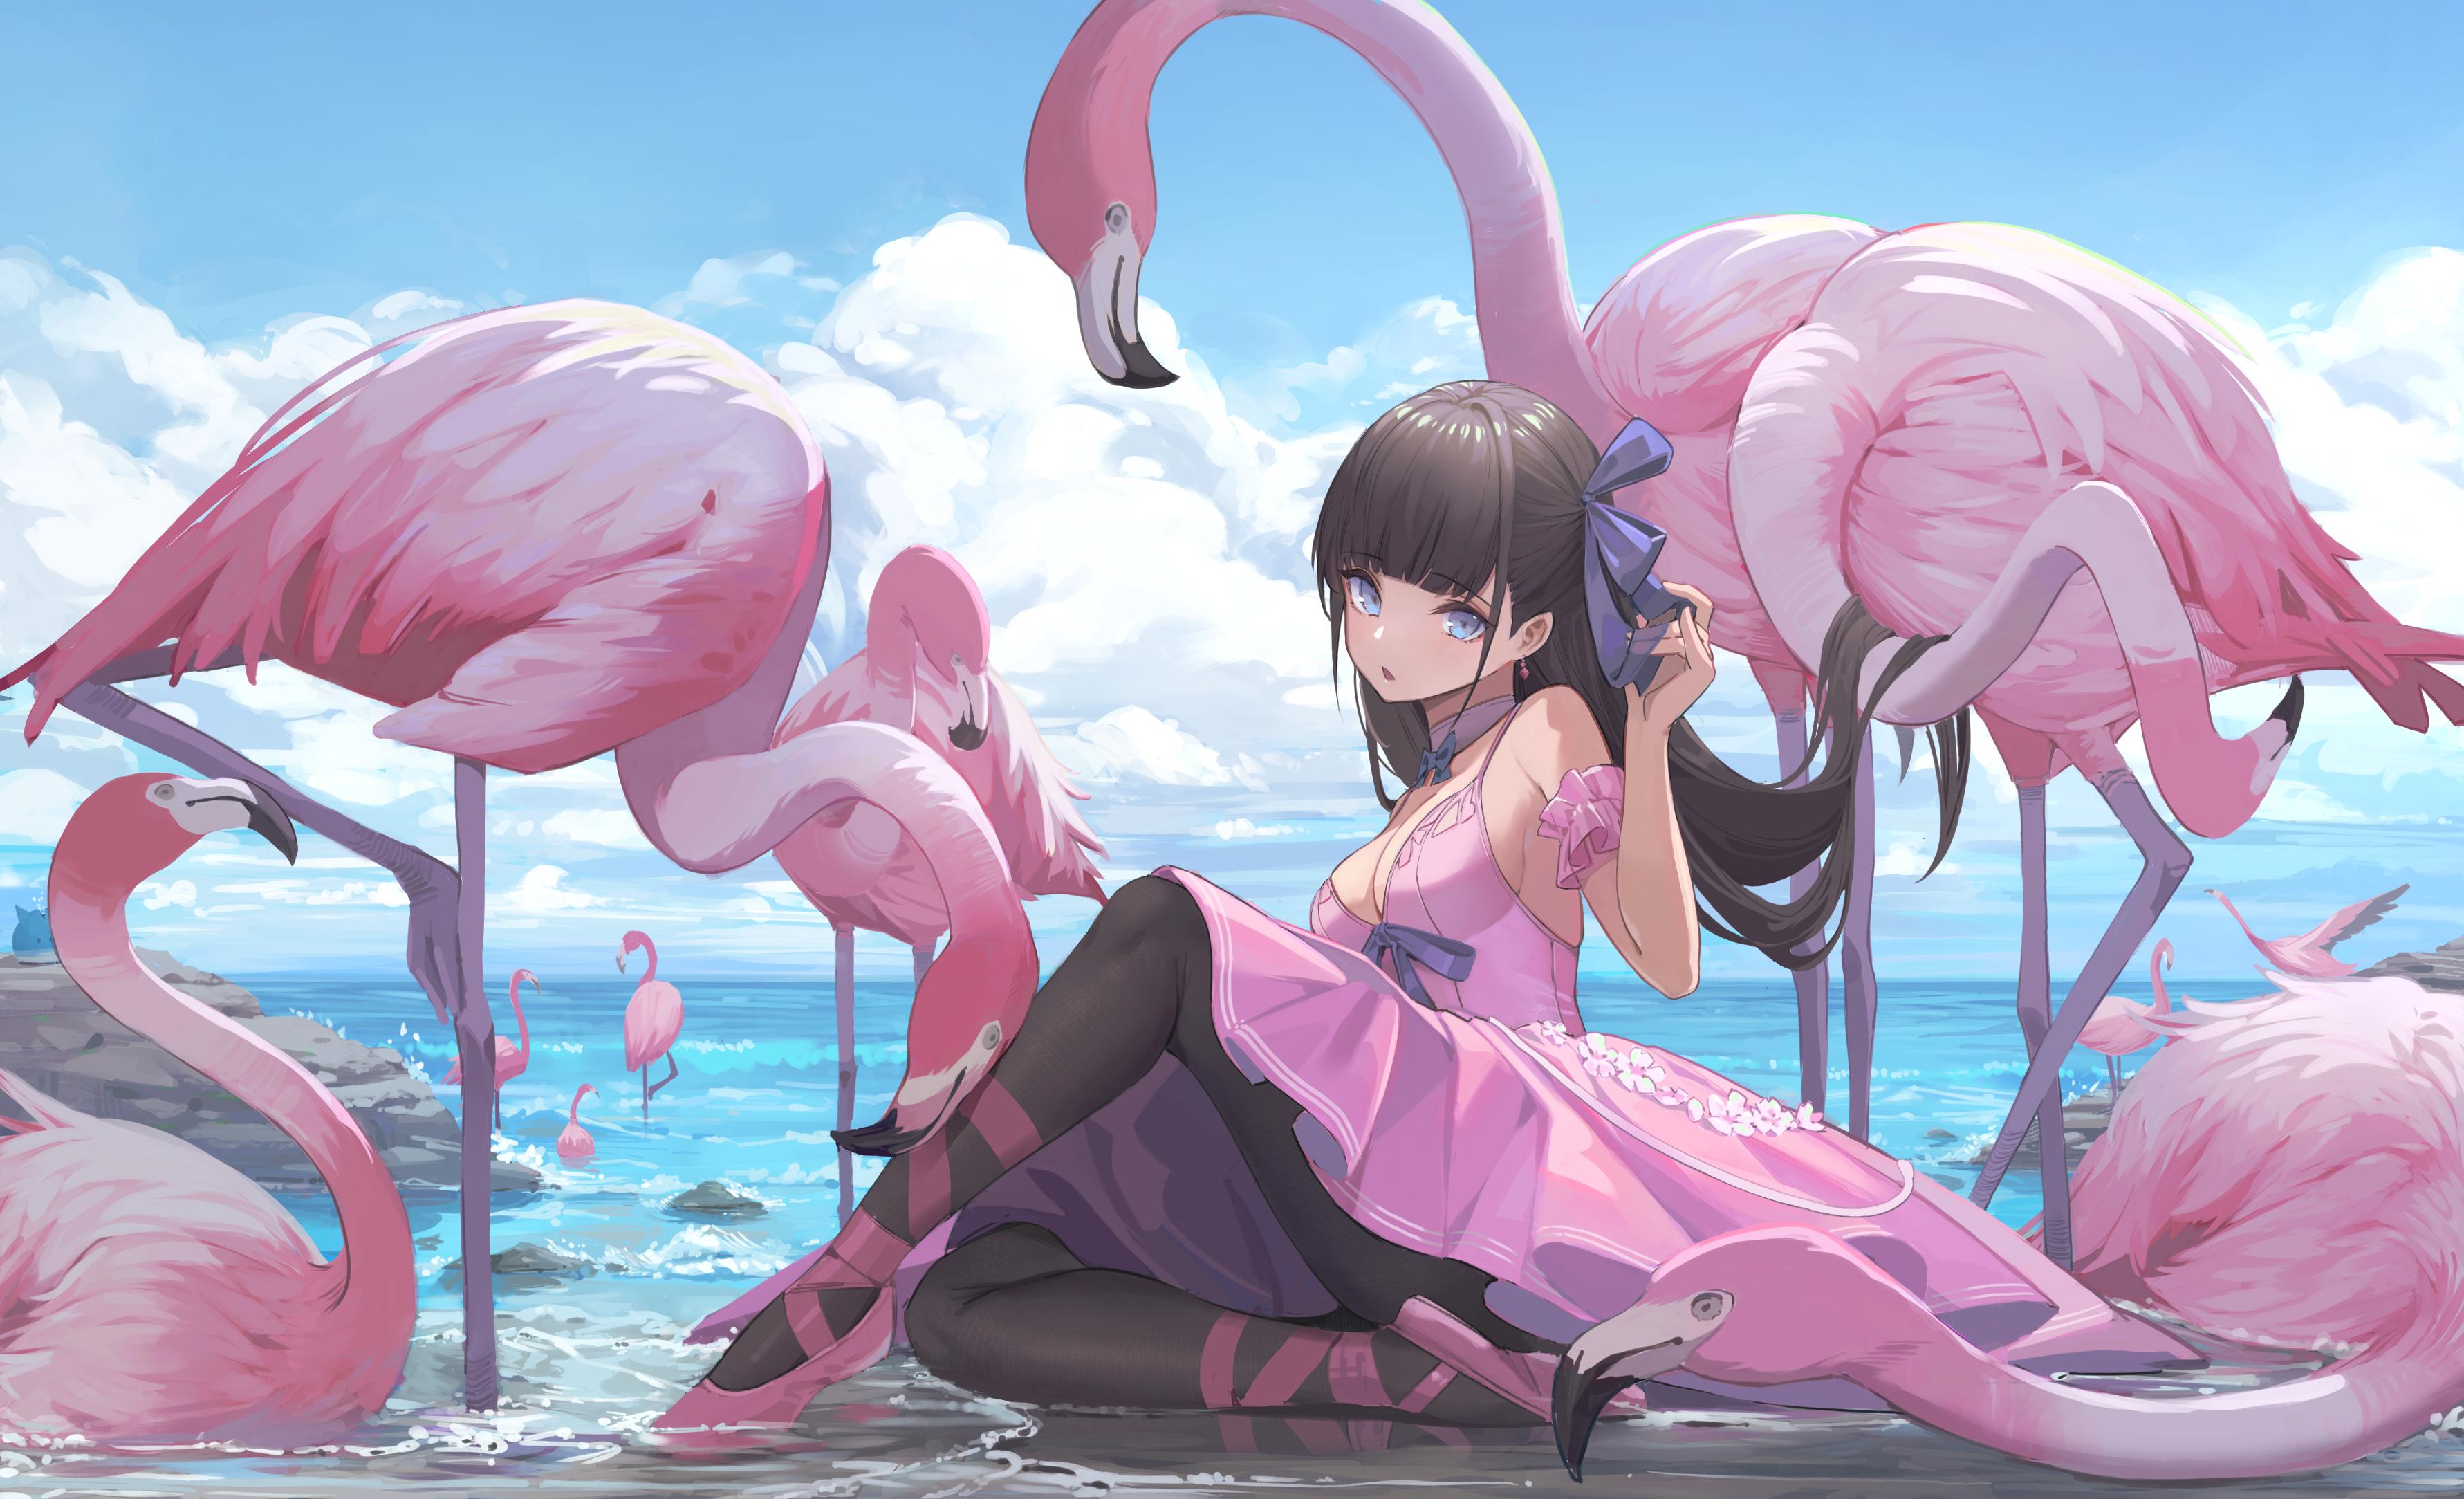 Anime 3563x2167 Nekojira anime anime girls sitting dress long hair bangs flamingos ballerina